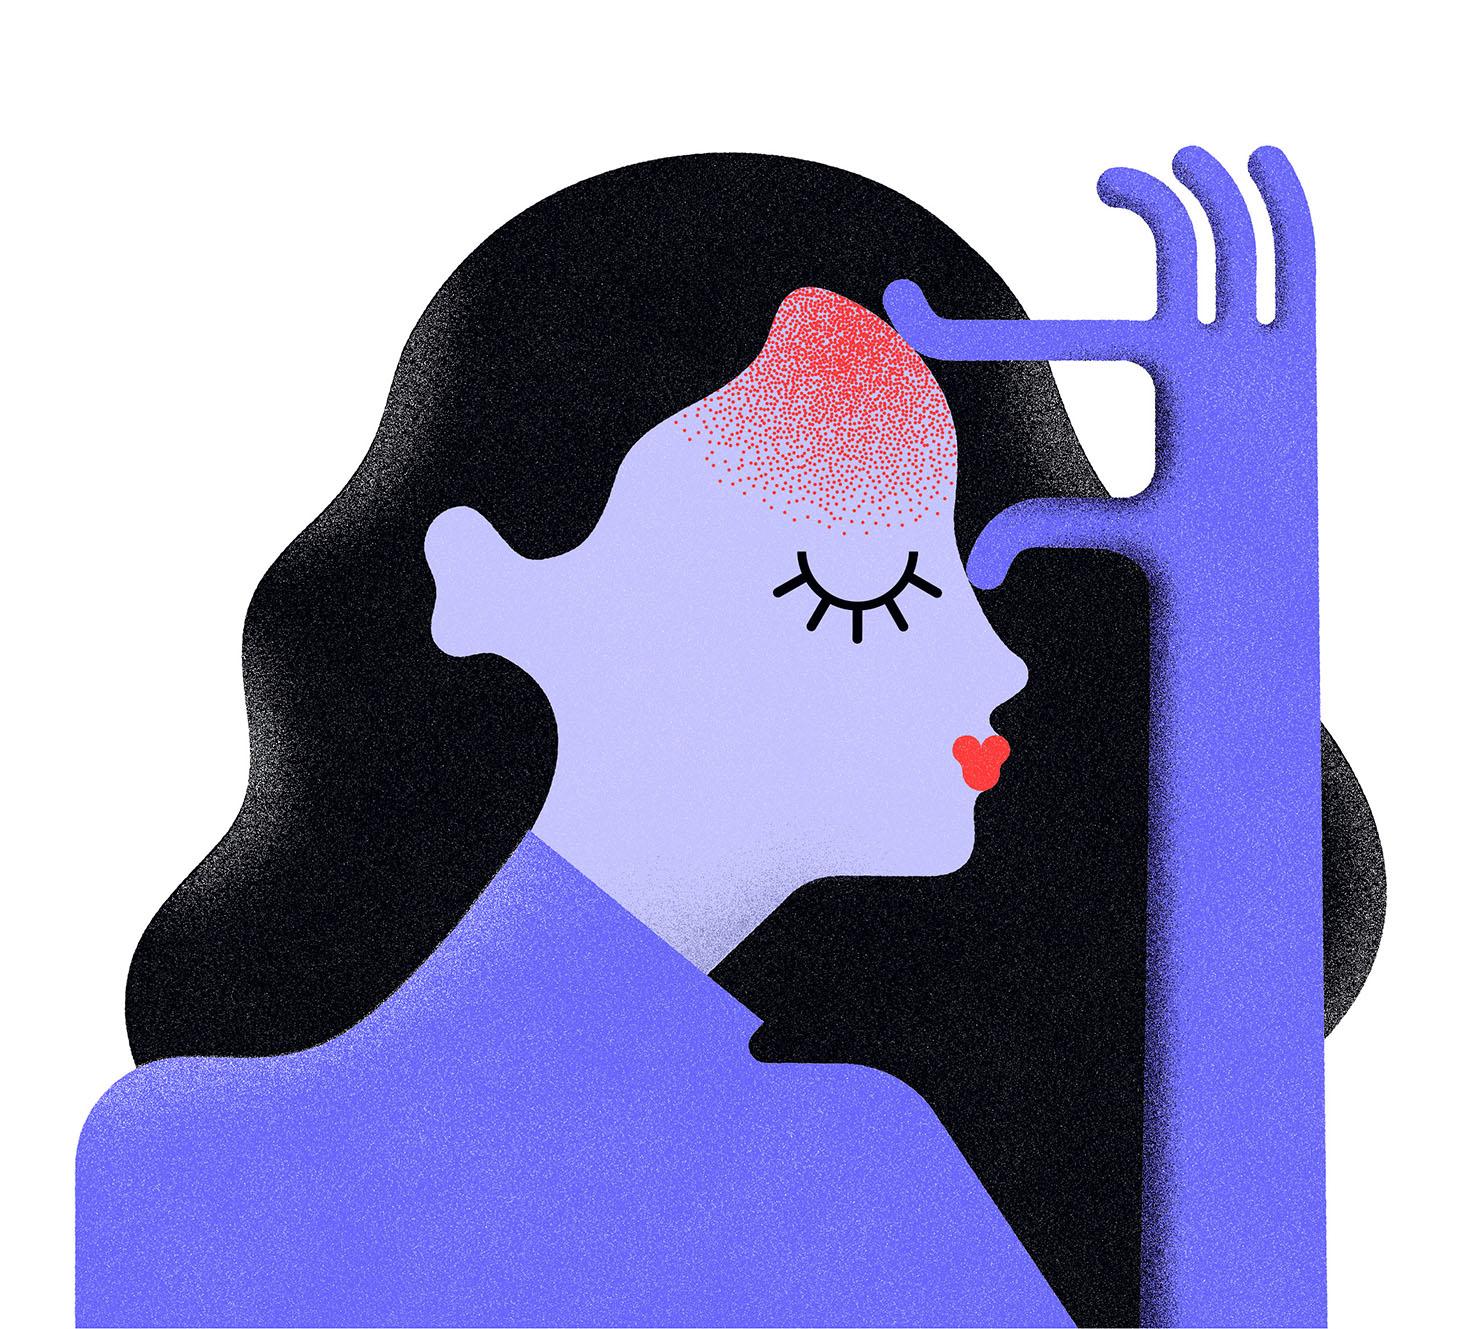 Freundin-Kopfschmerzen-Titel-RZ